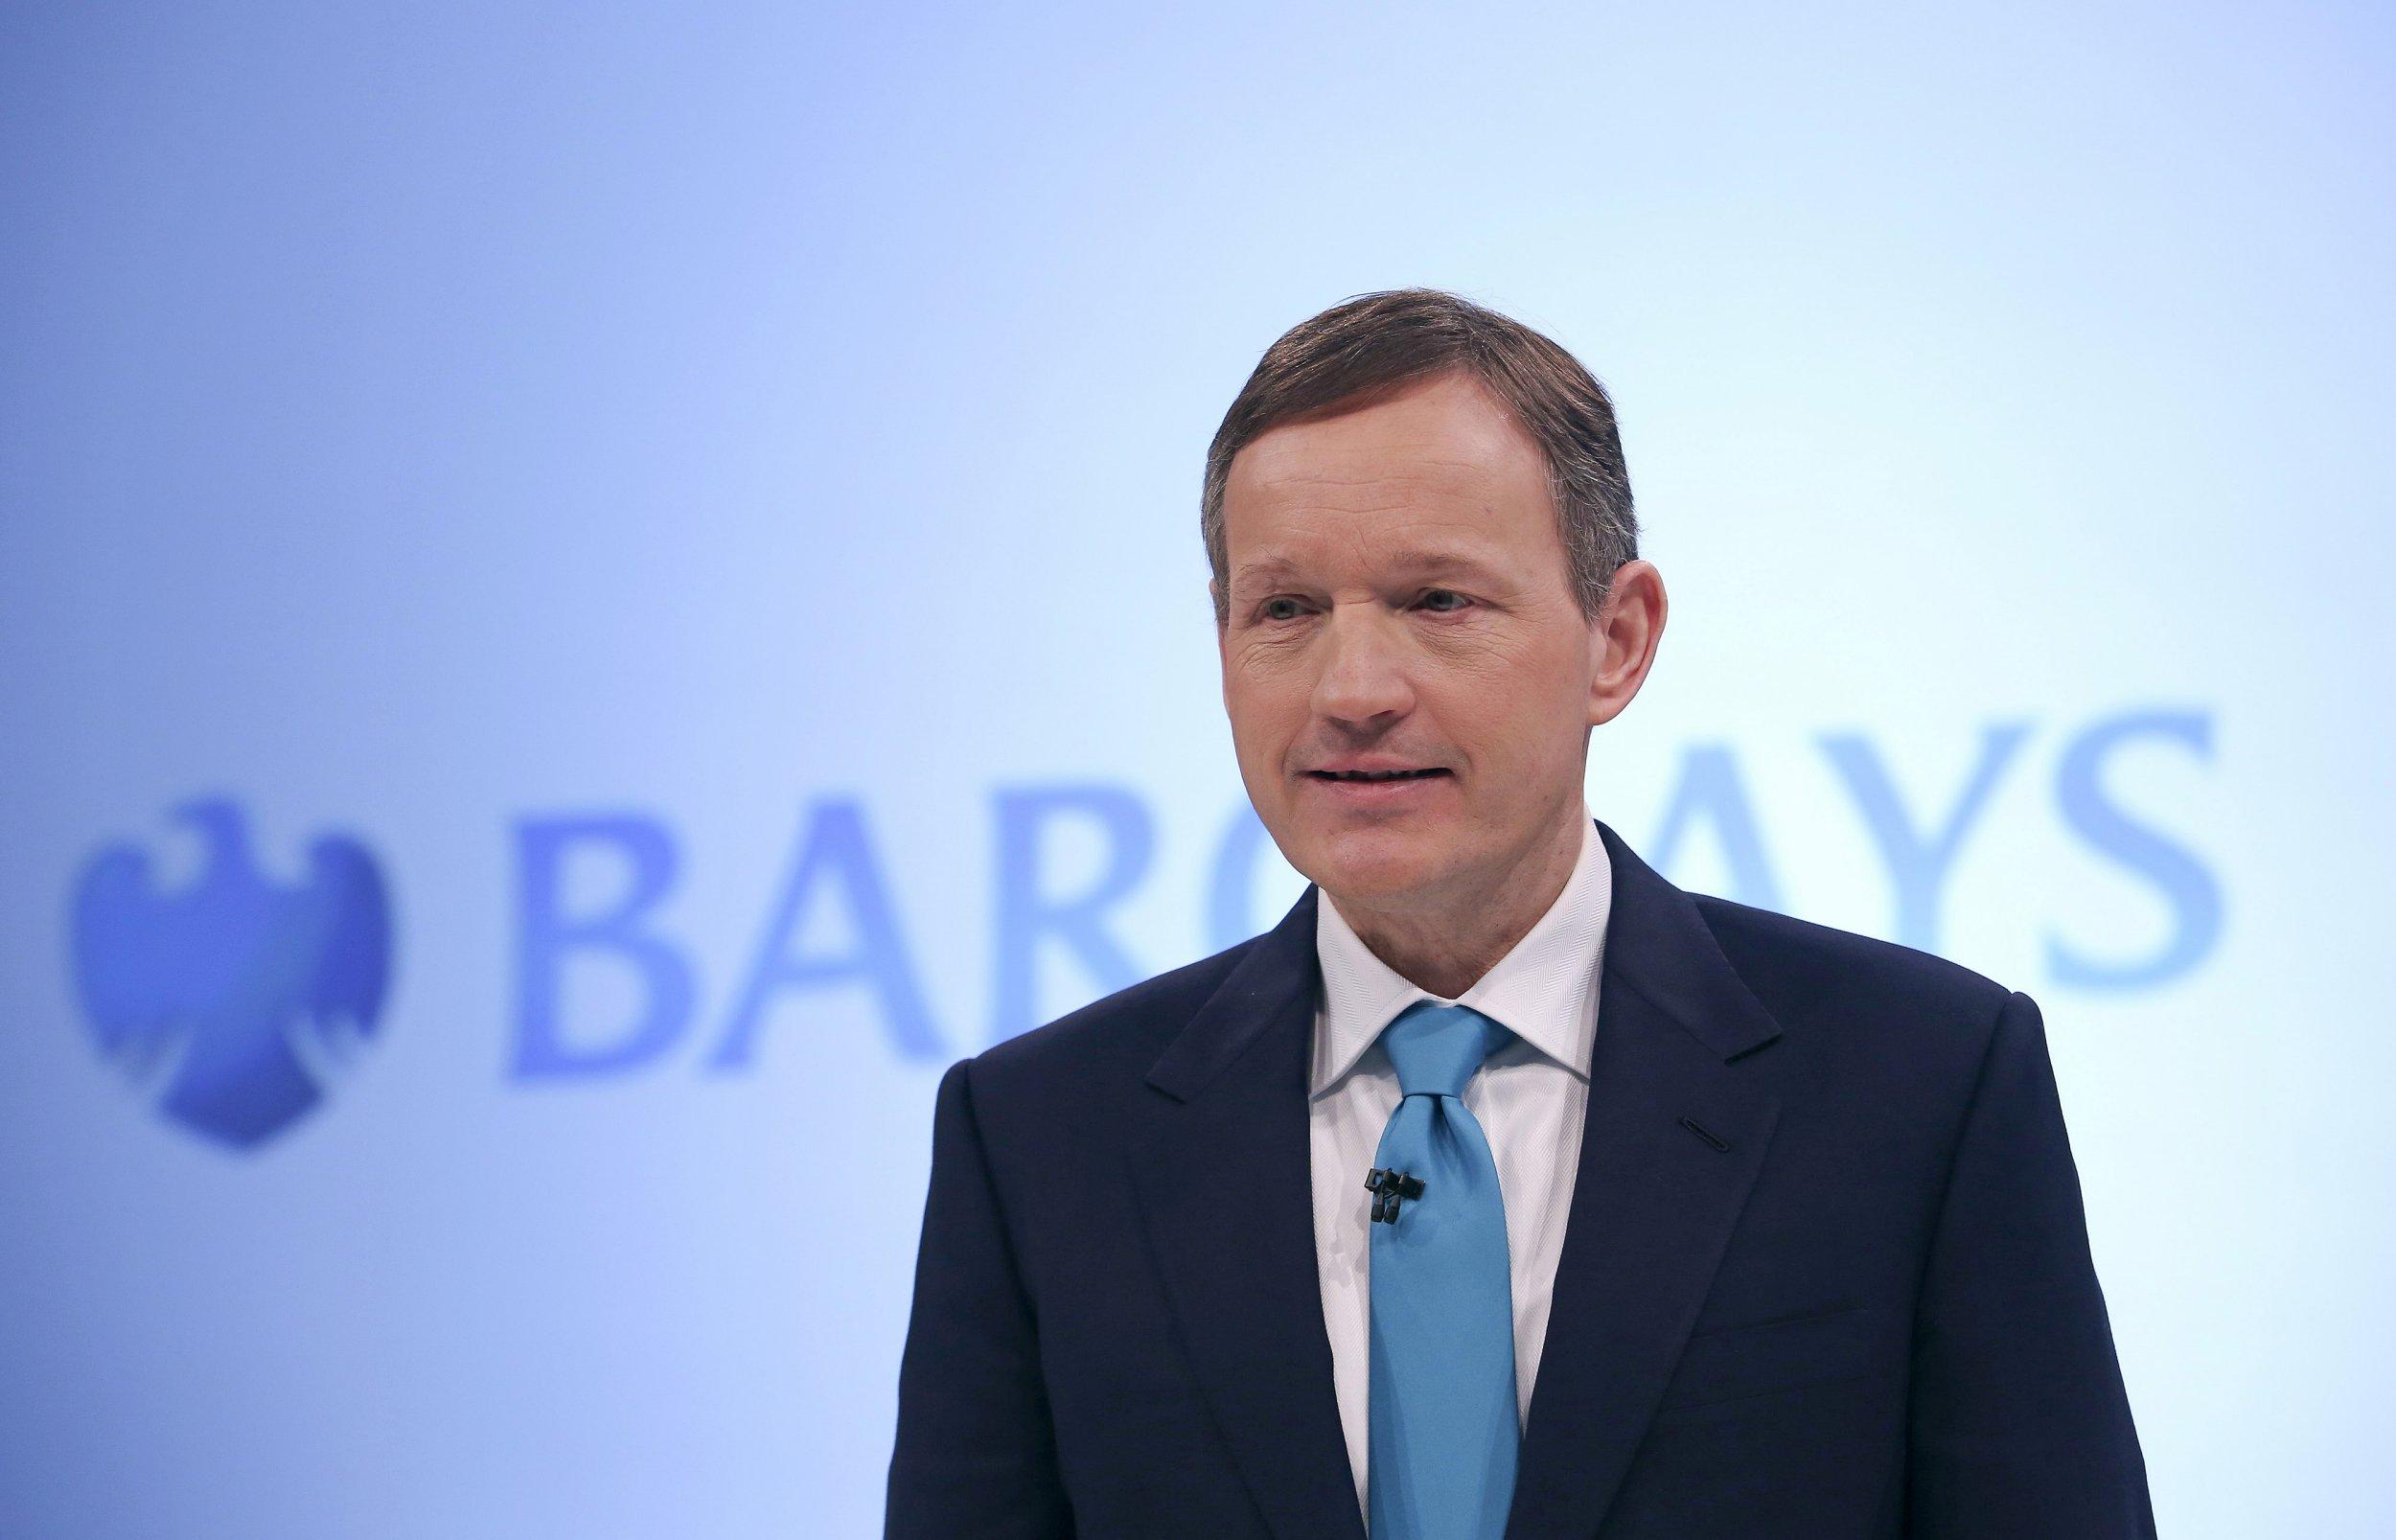 Man gets sacked then 'gets bonus of £500,000' – yep, he's a banker